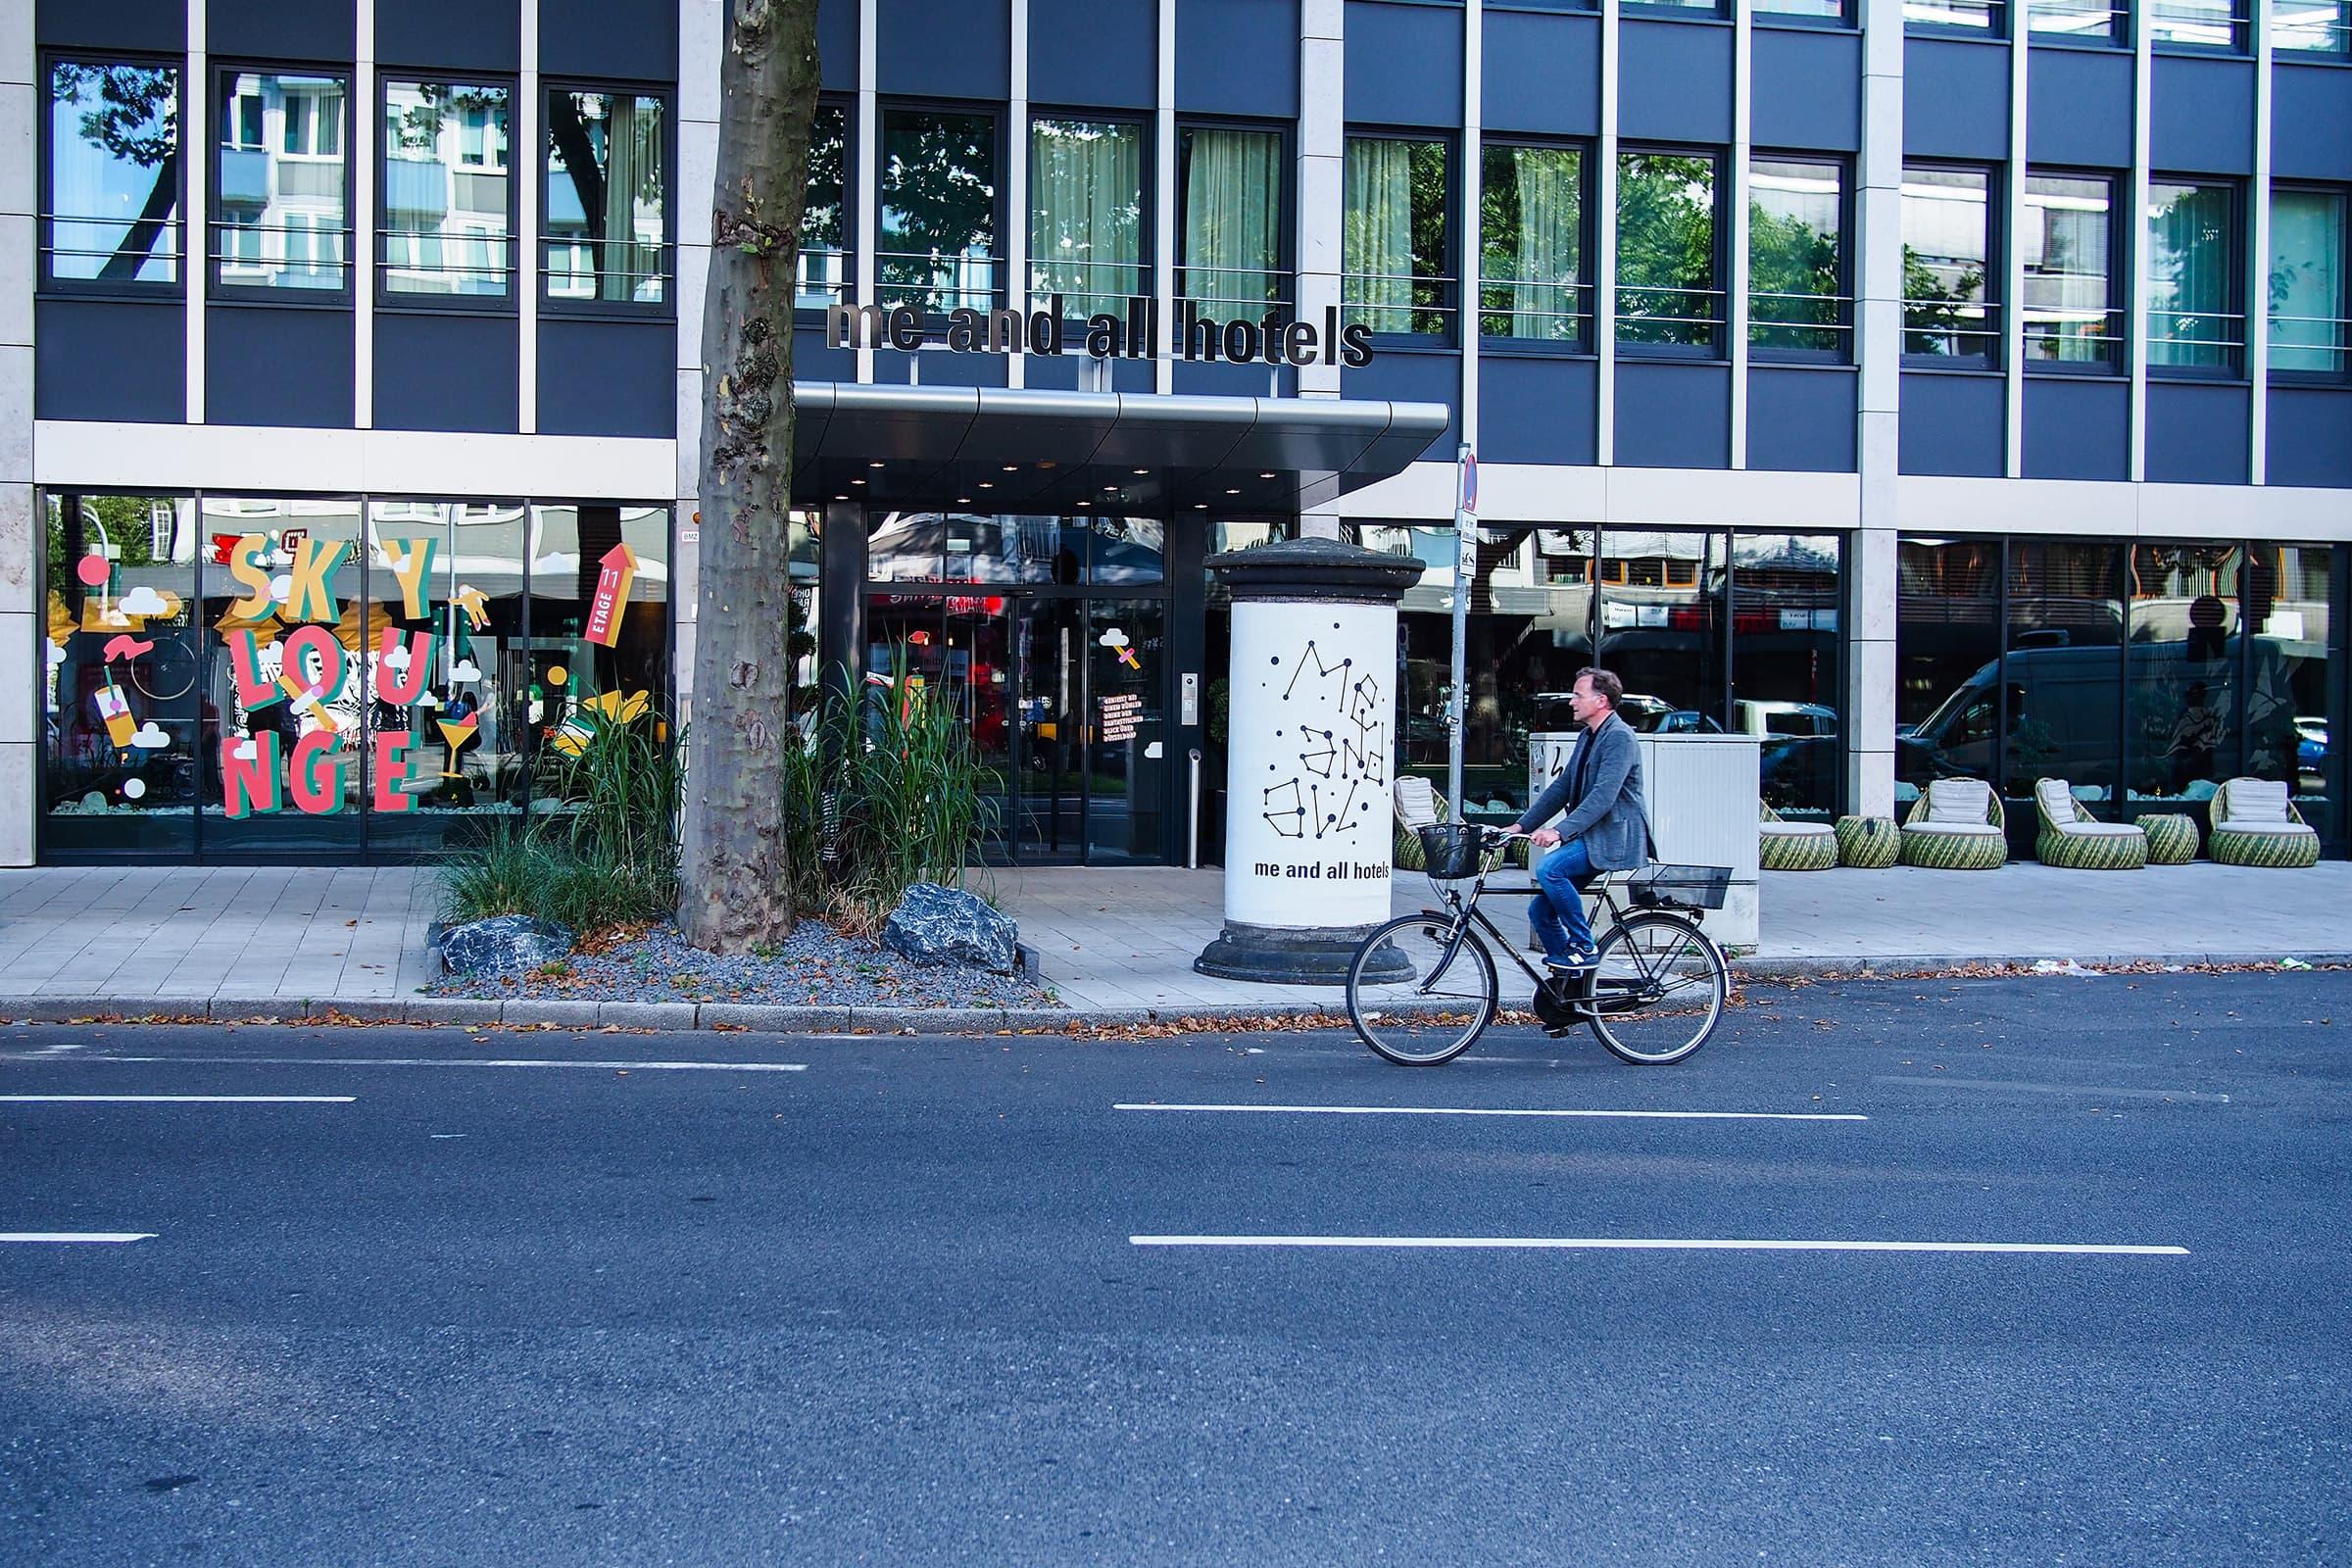 Schaufenster, Beklebung, Plot, Illustration, Lindner Gruppe, Me and all Hotel, Düsseldorf, Immermannstrasse